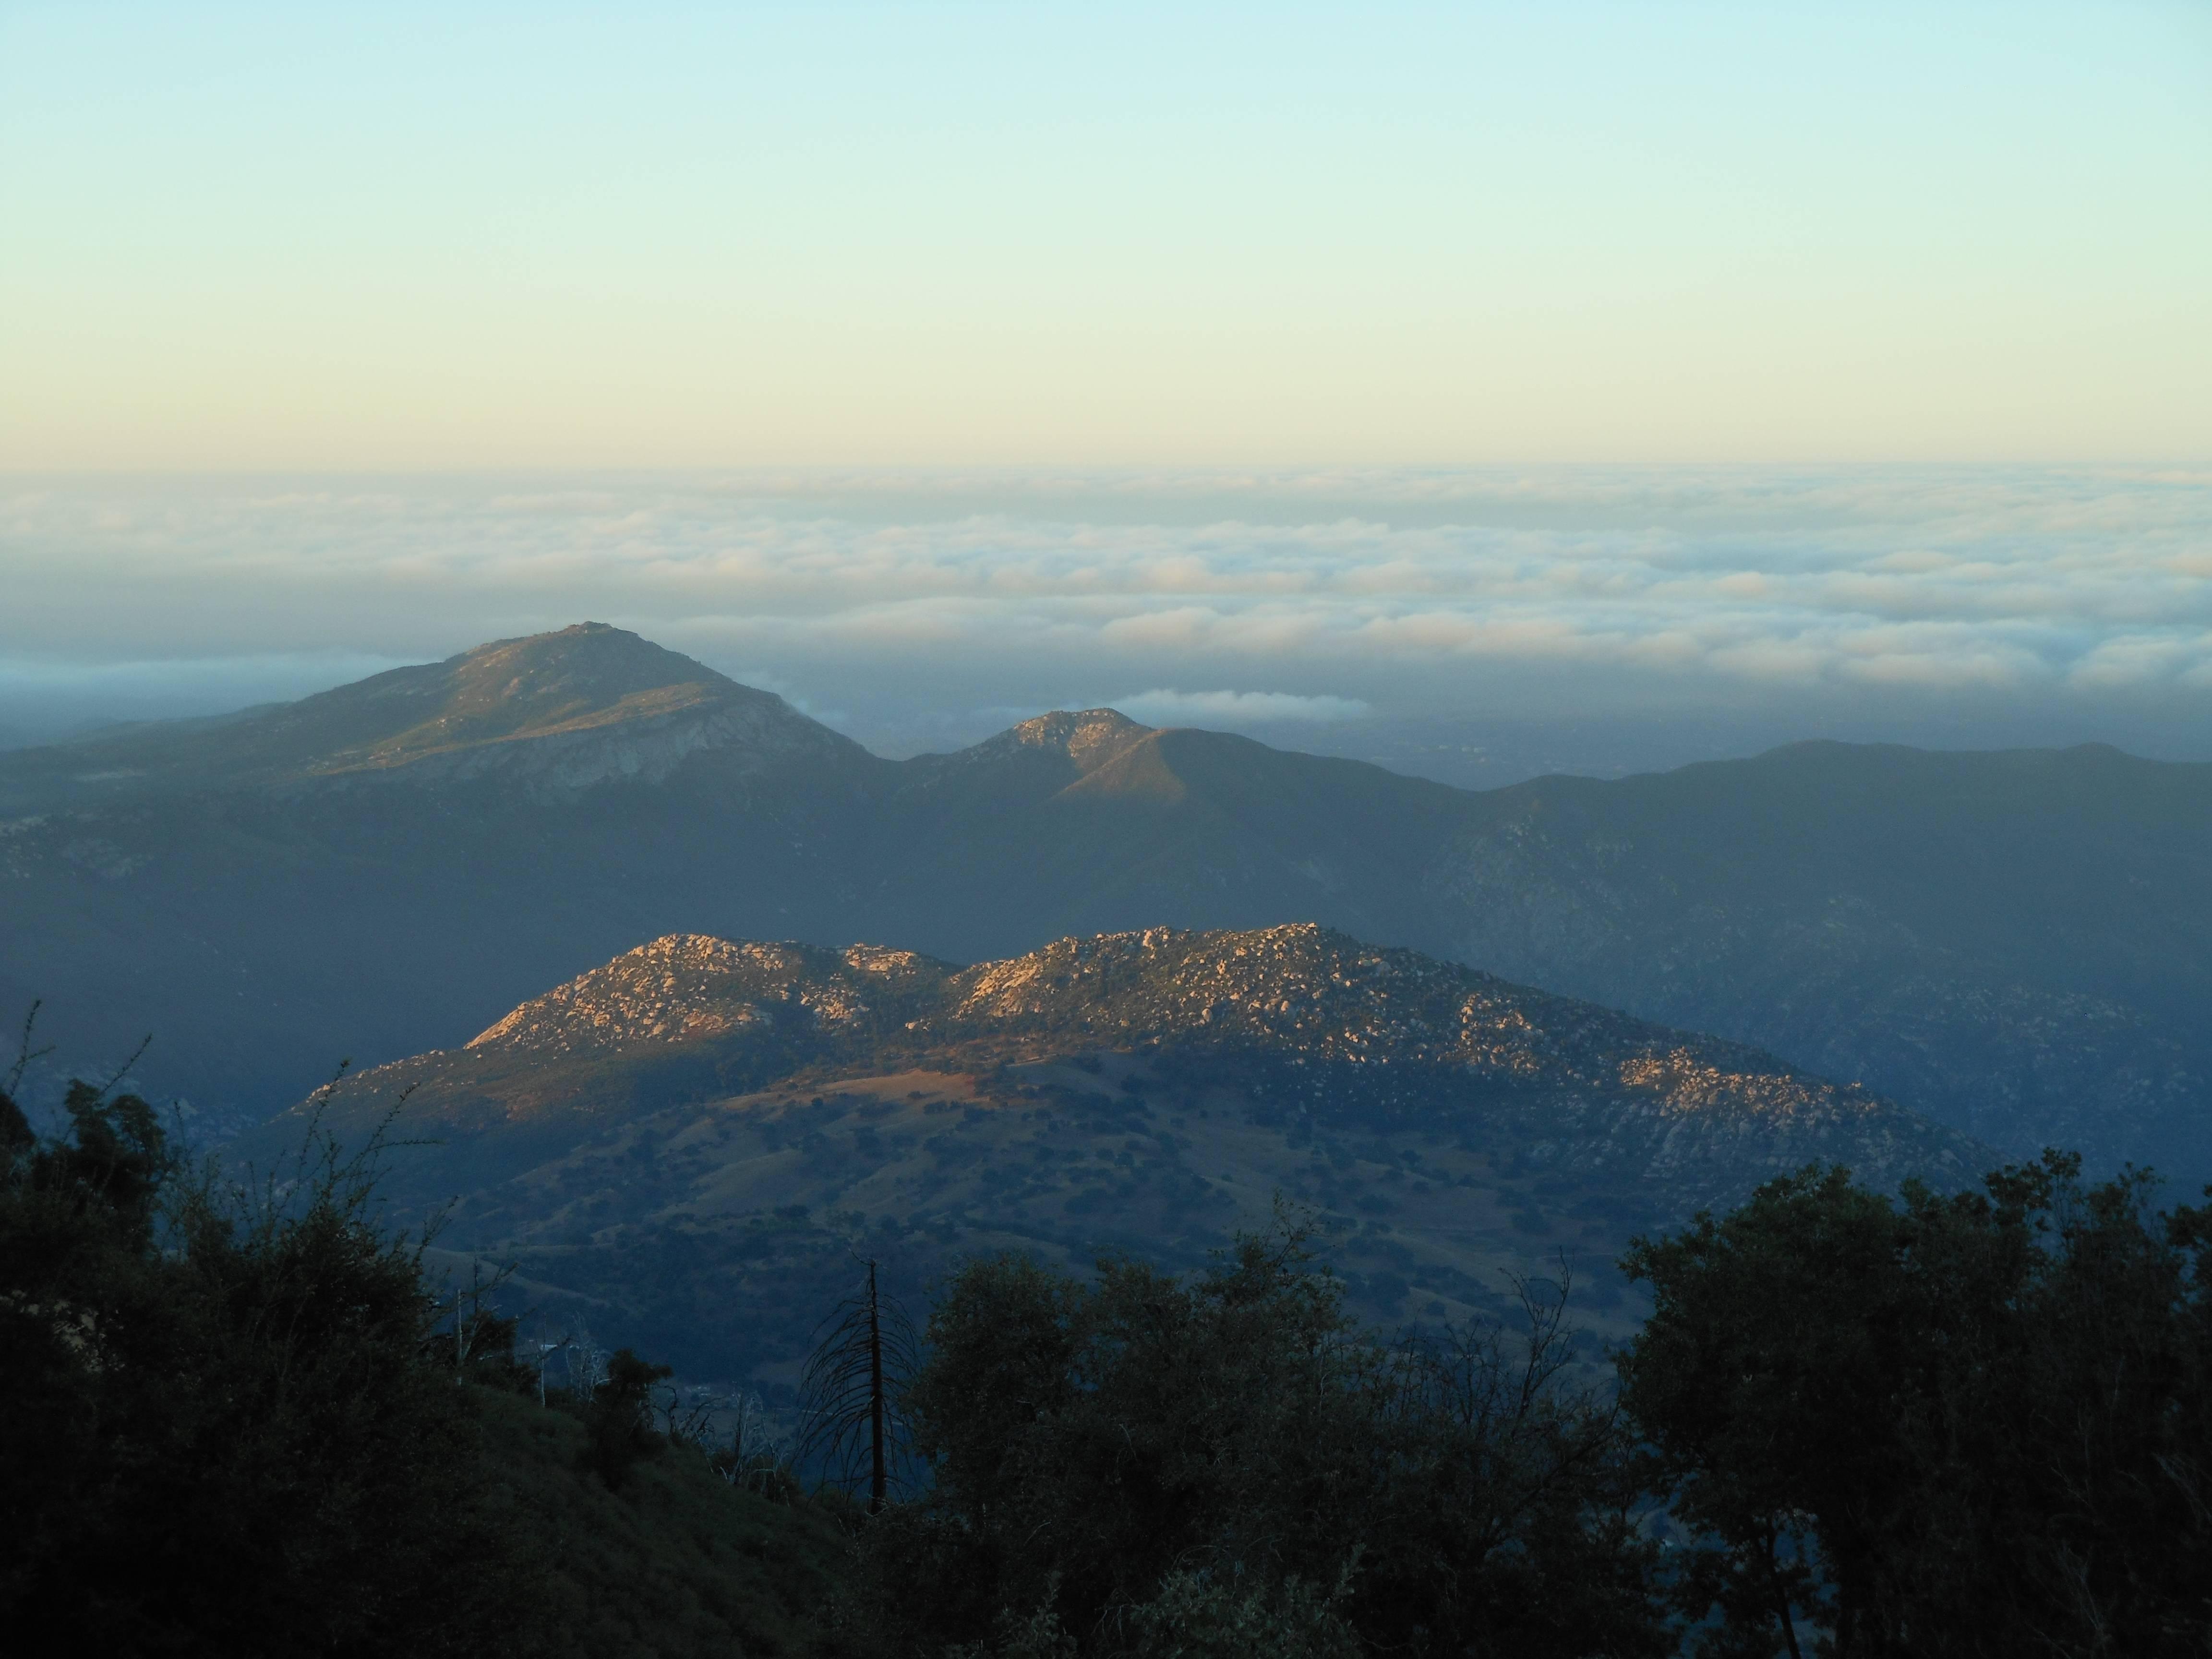 Sunrise from atop Palomar mountain